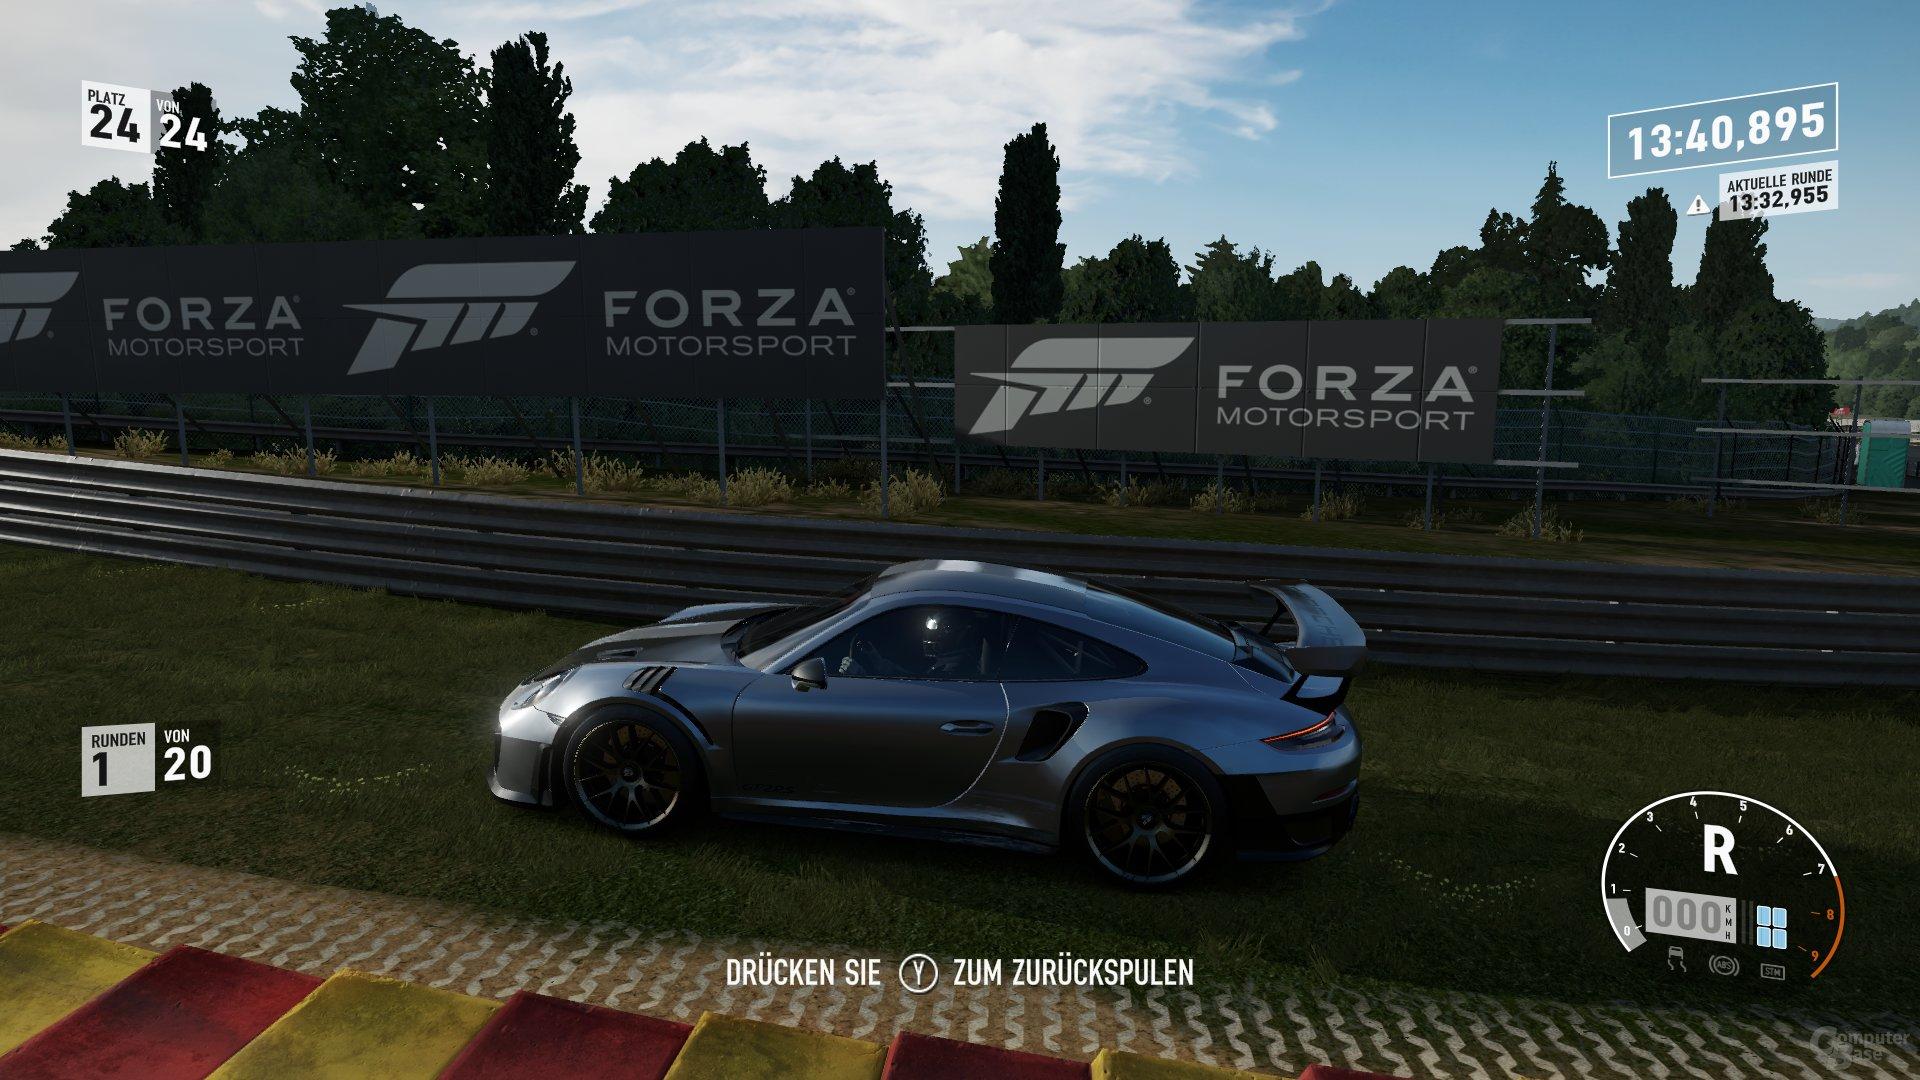 Forza Motorsport 7 auf Xbox One